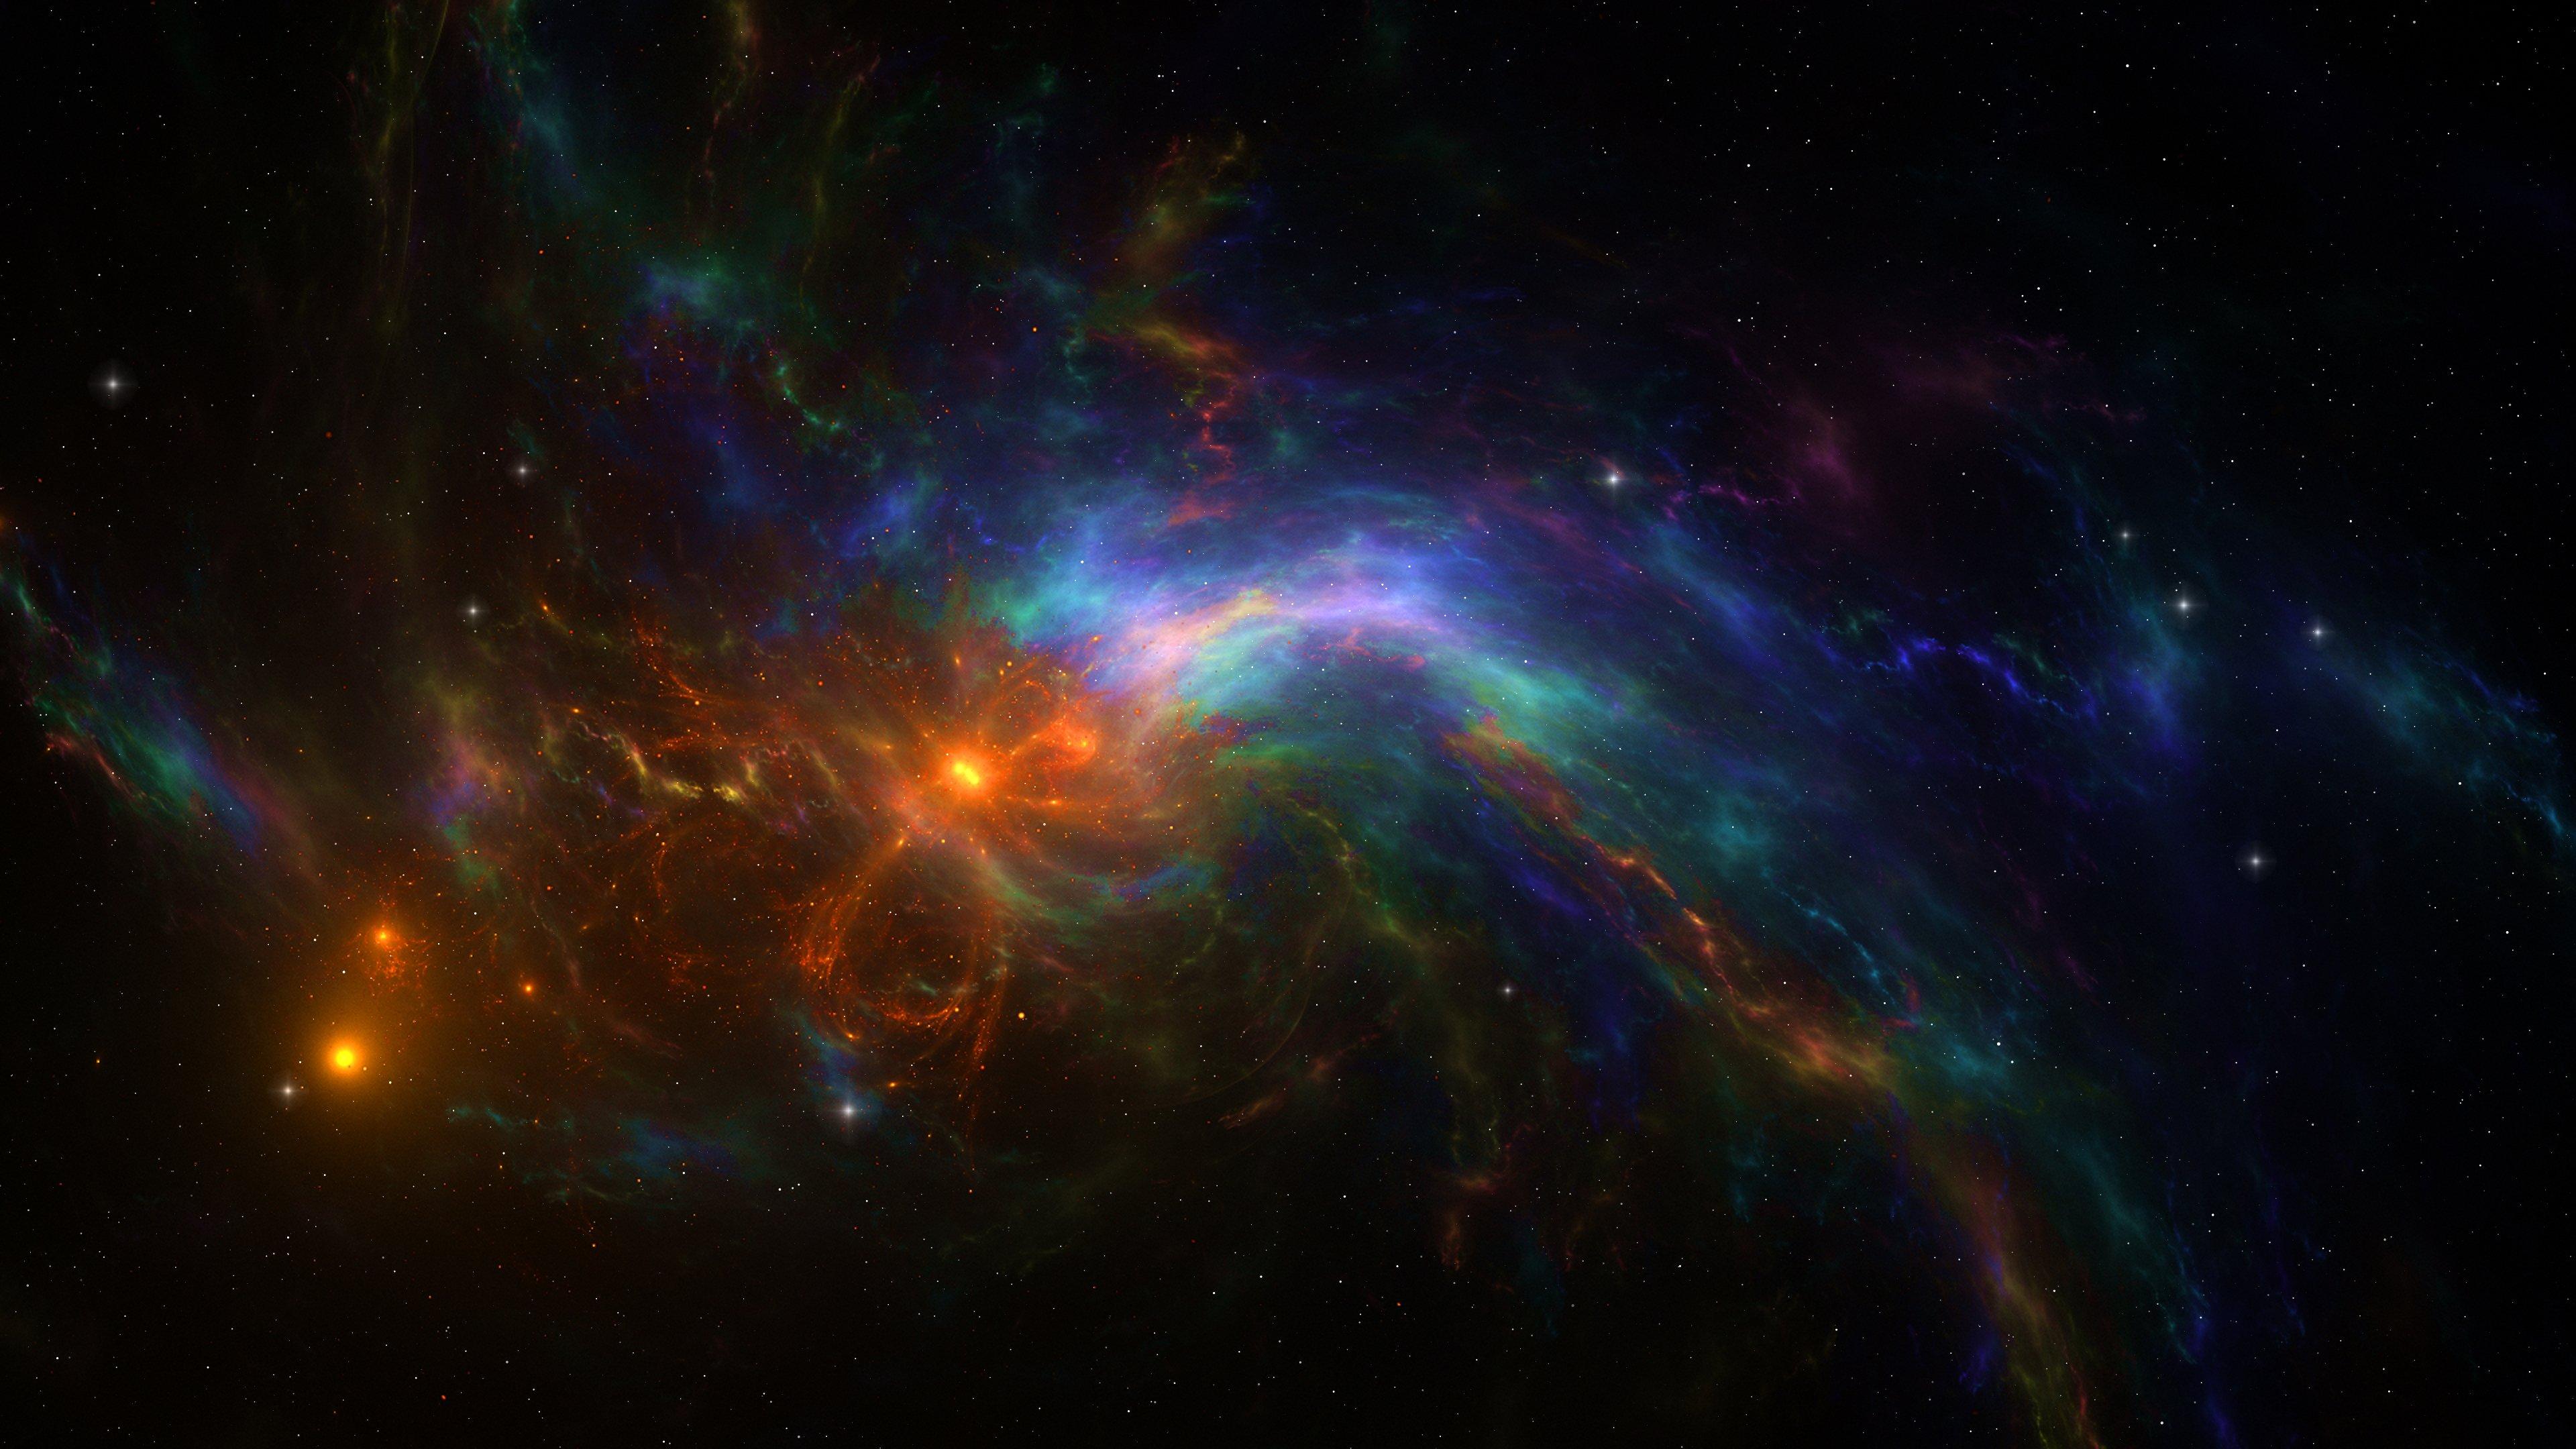 Fondos de pantalla Nebula colorida